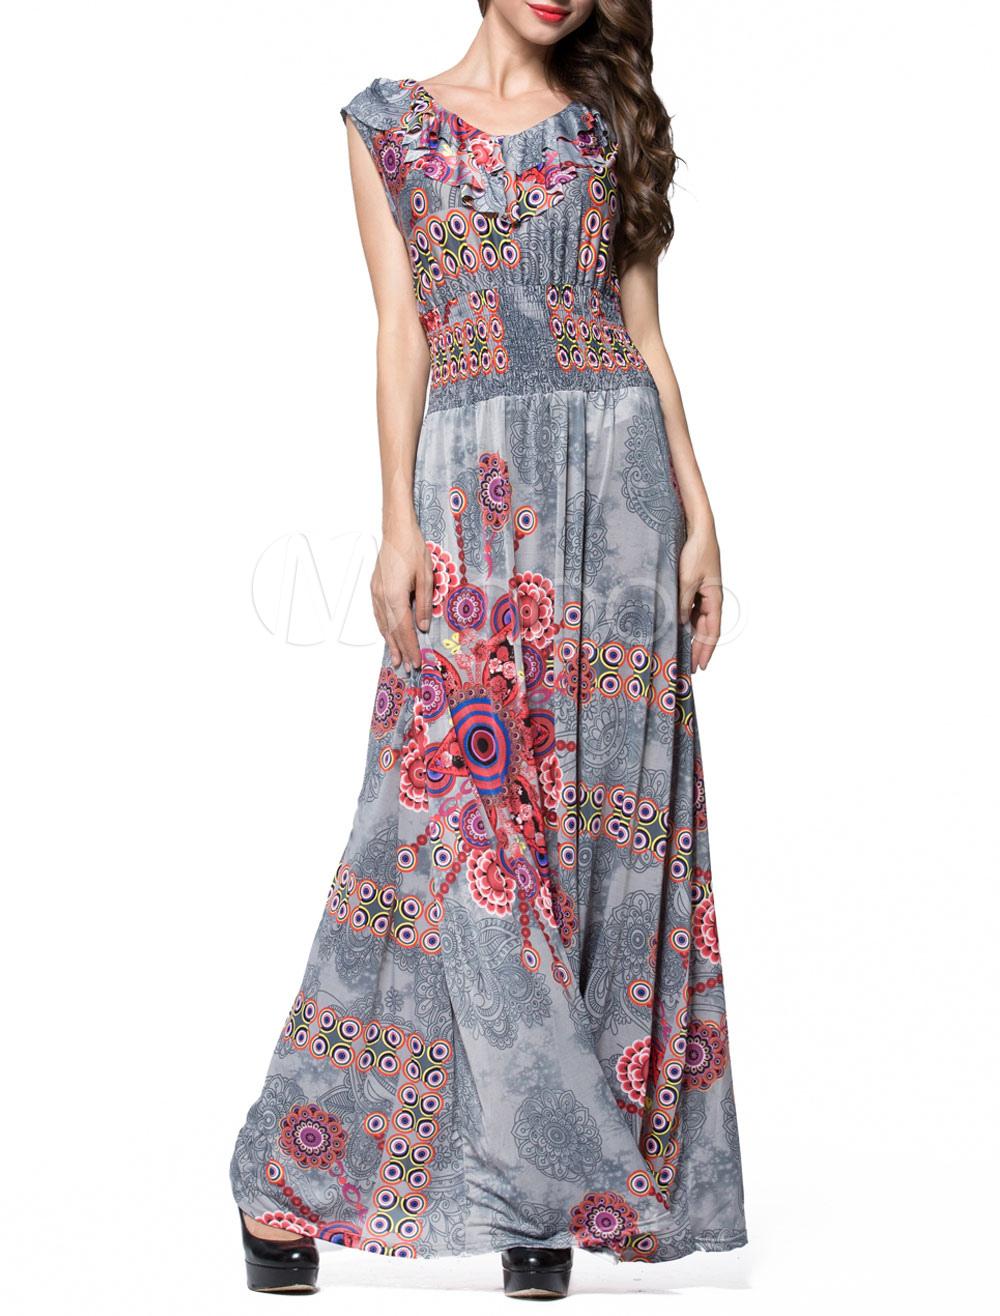 Vintage Maxi Dress Boho Printed Short Sleeve Jewel Neck Slim Fit Summer Long Dress